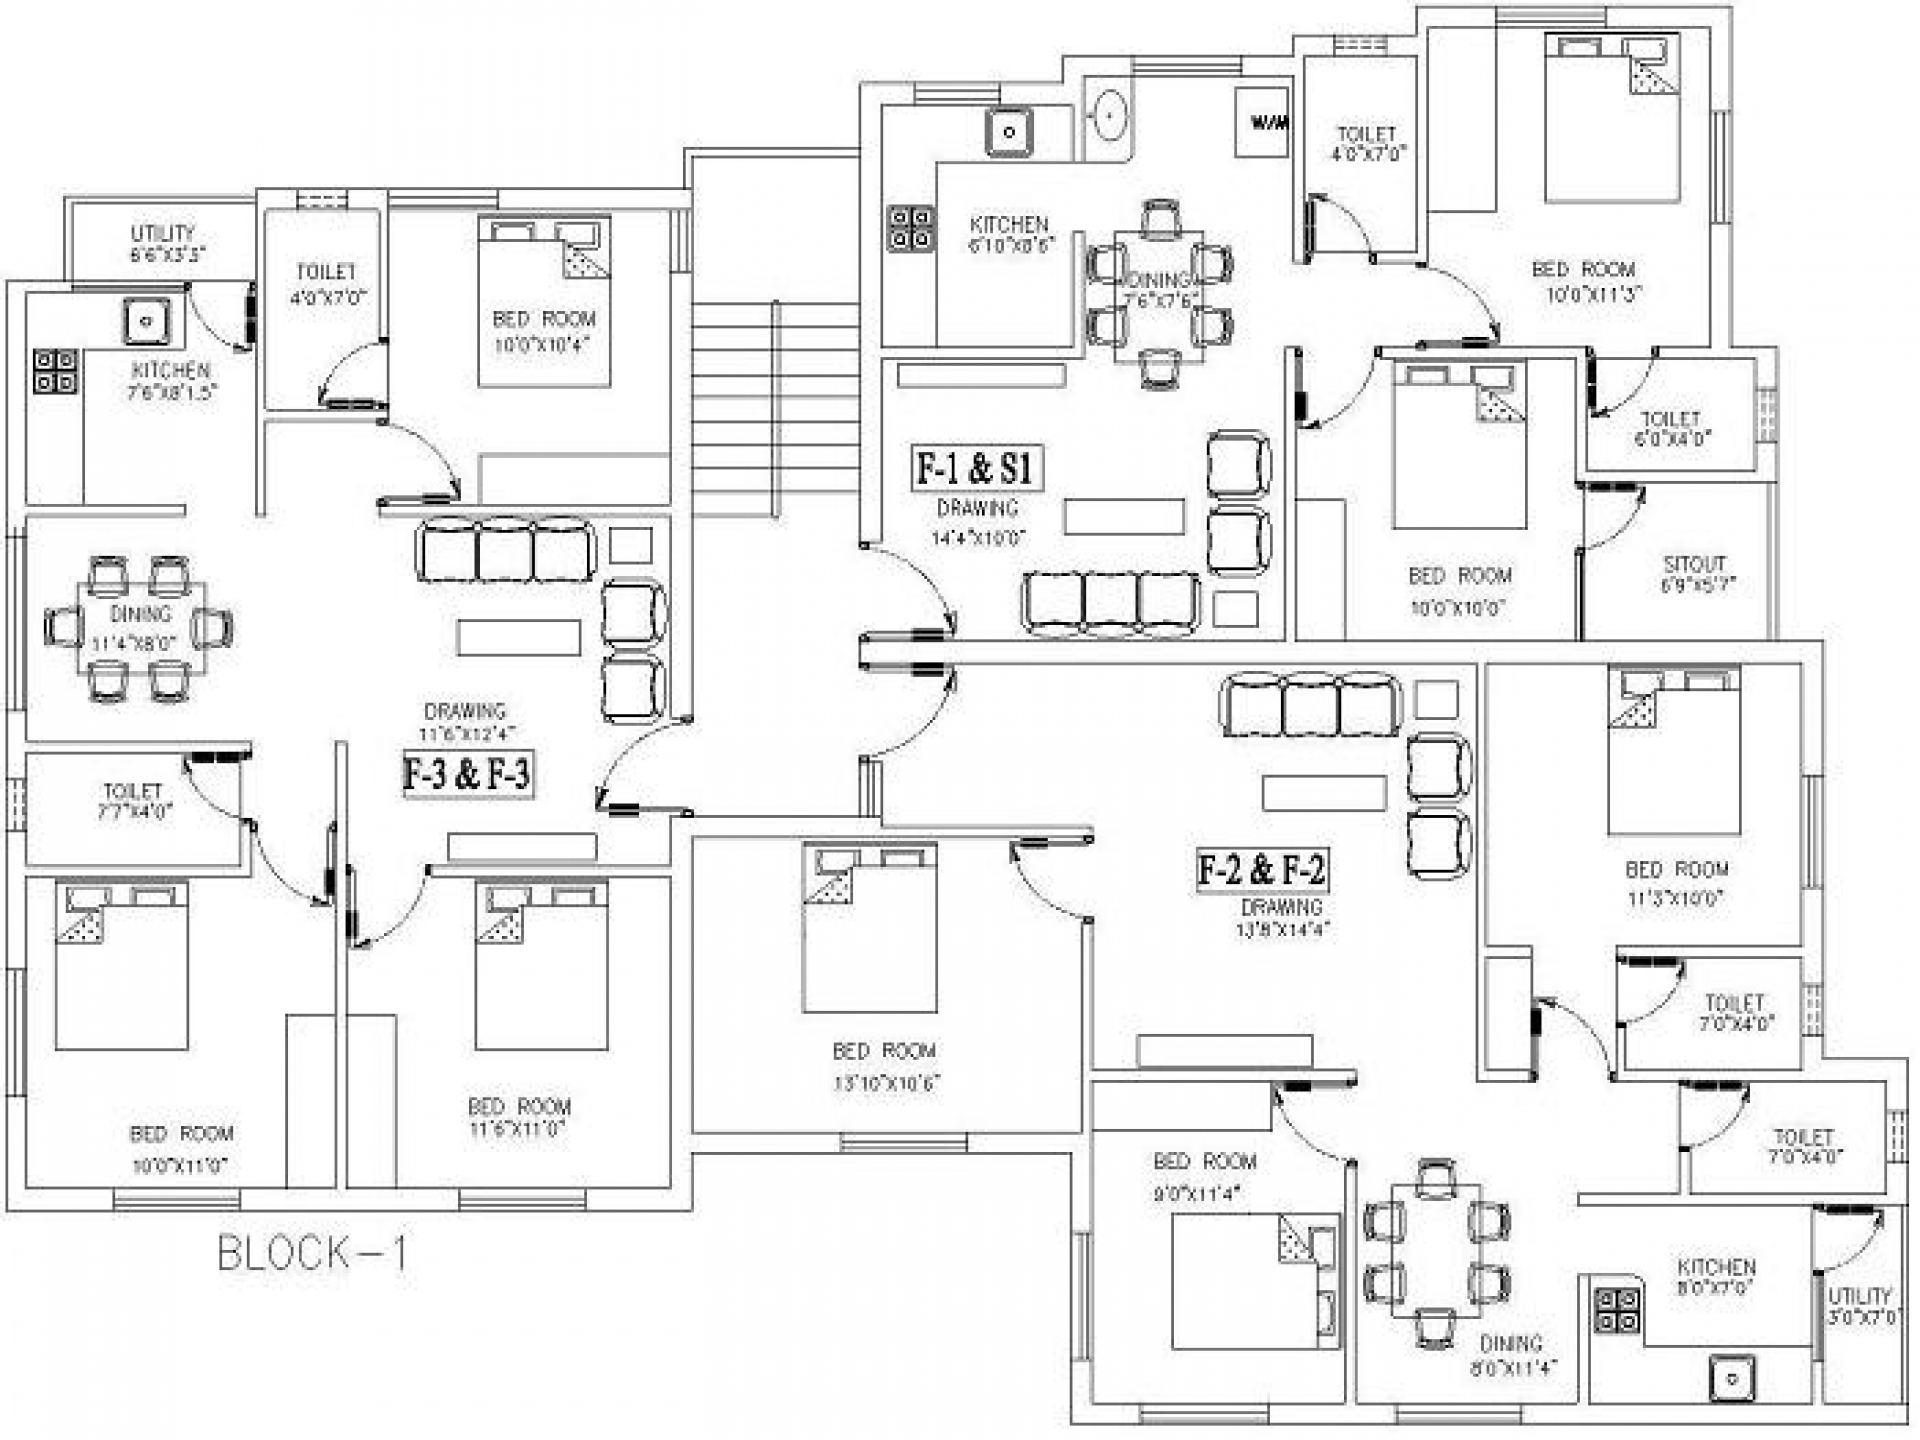 1920x1440 Home Depot Store Floor Plan